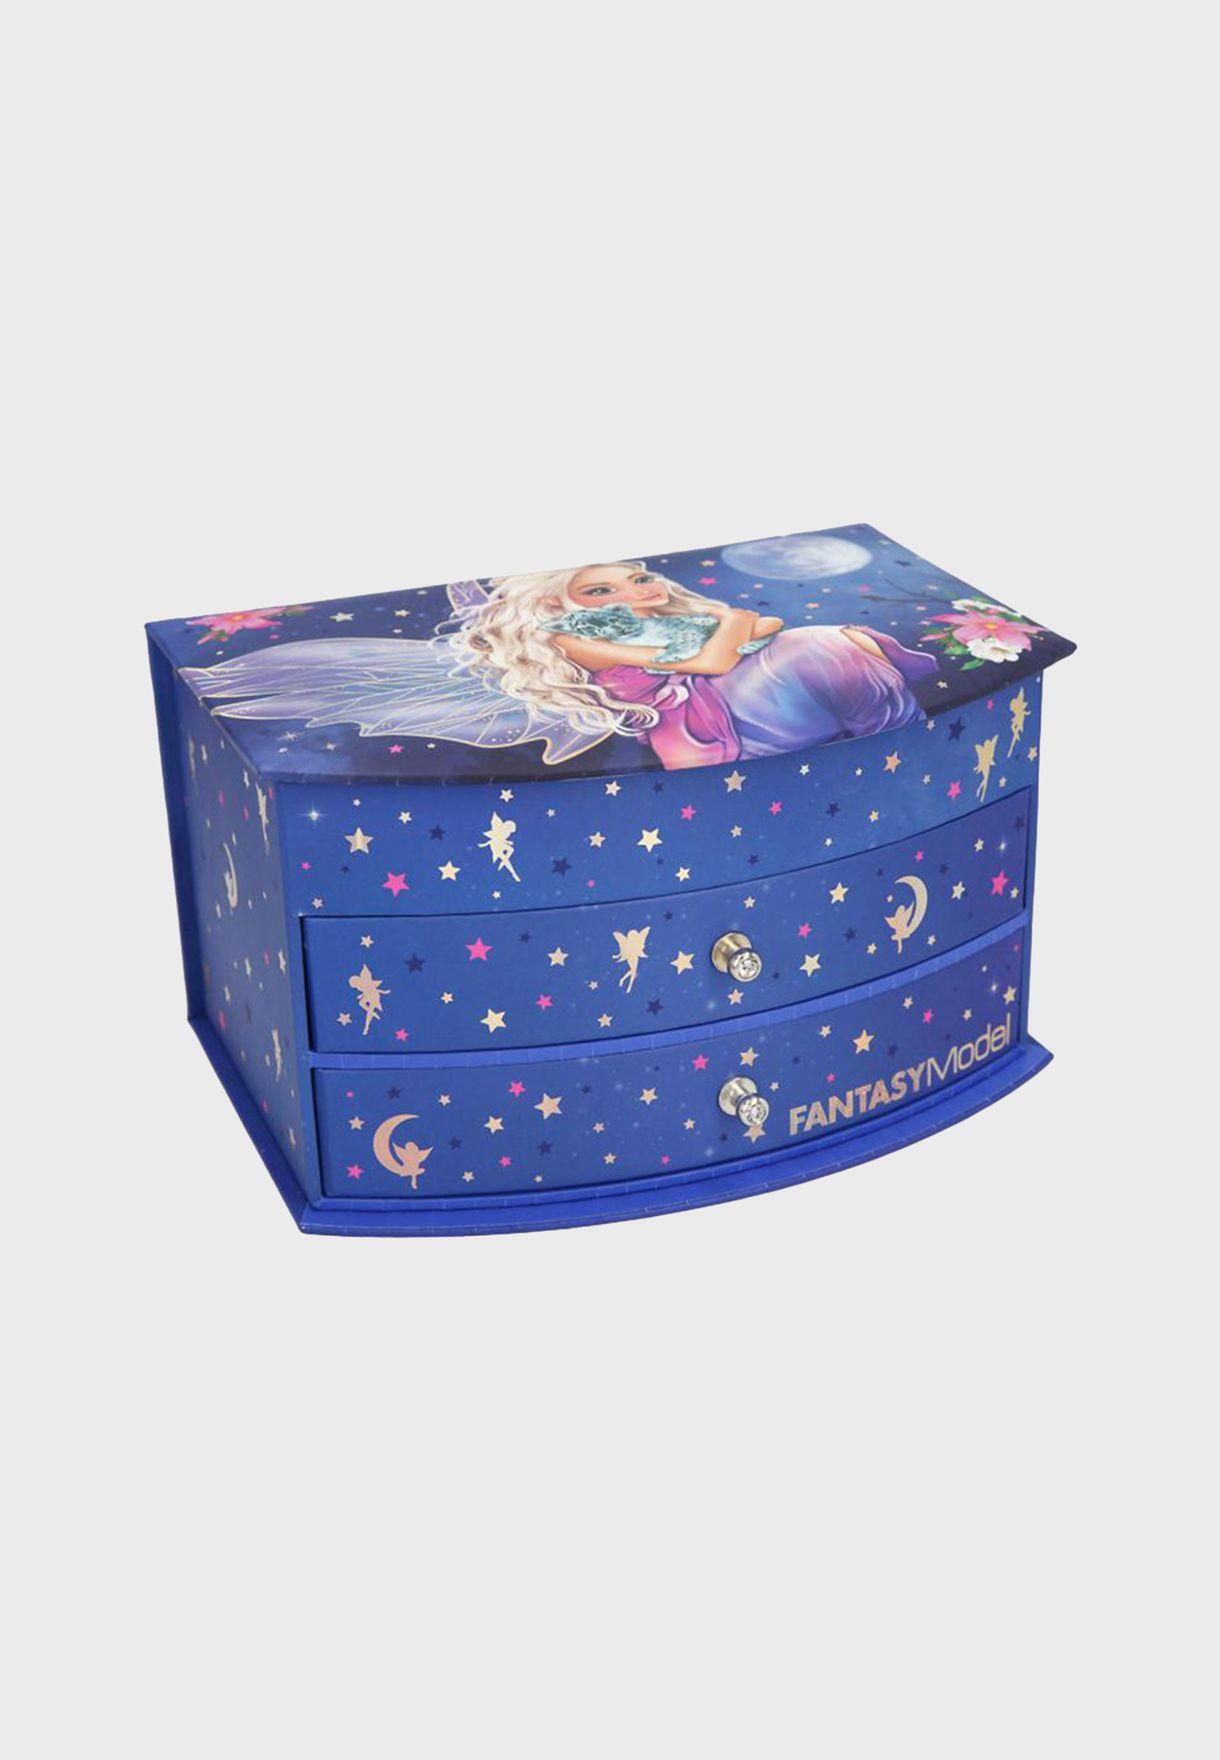 Fantasy Model Jewellery Box